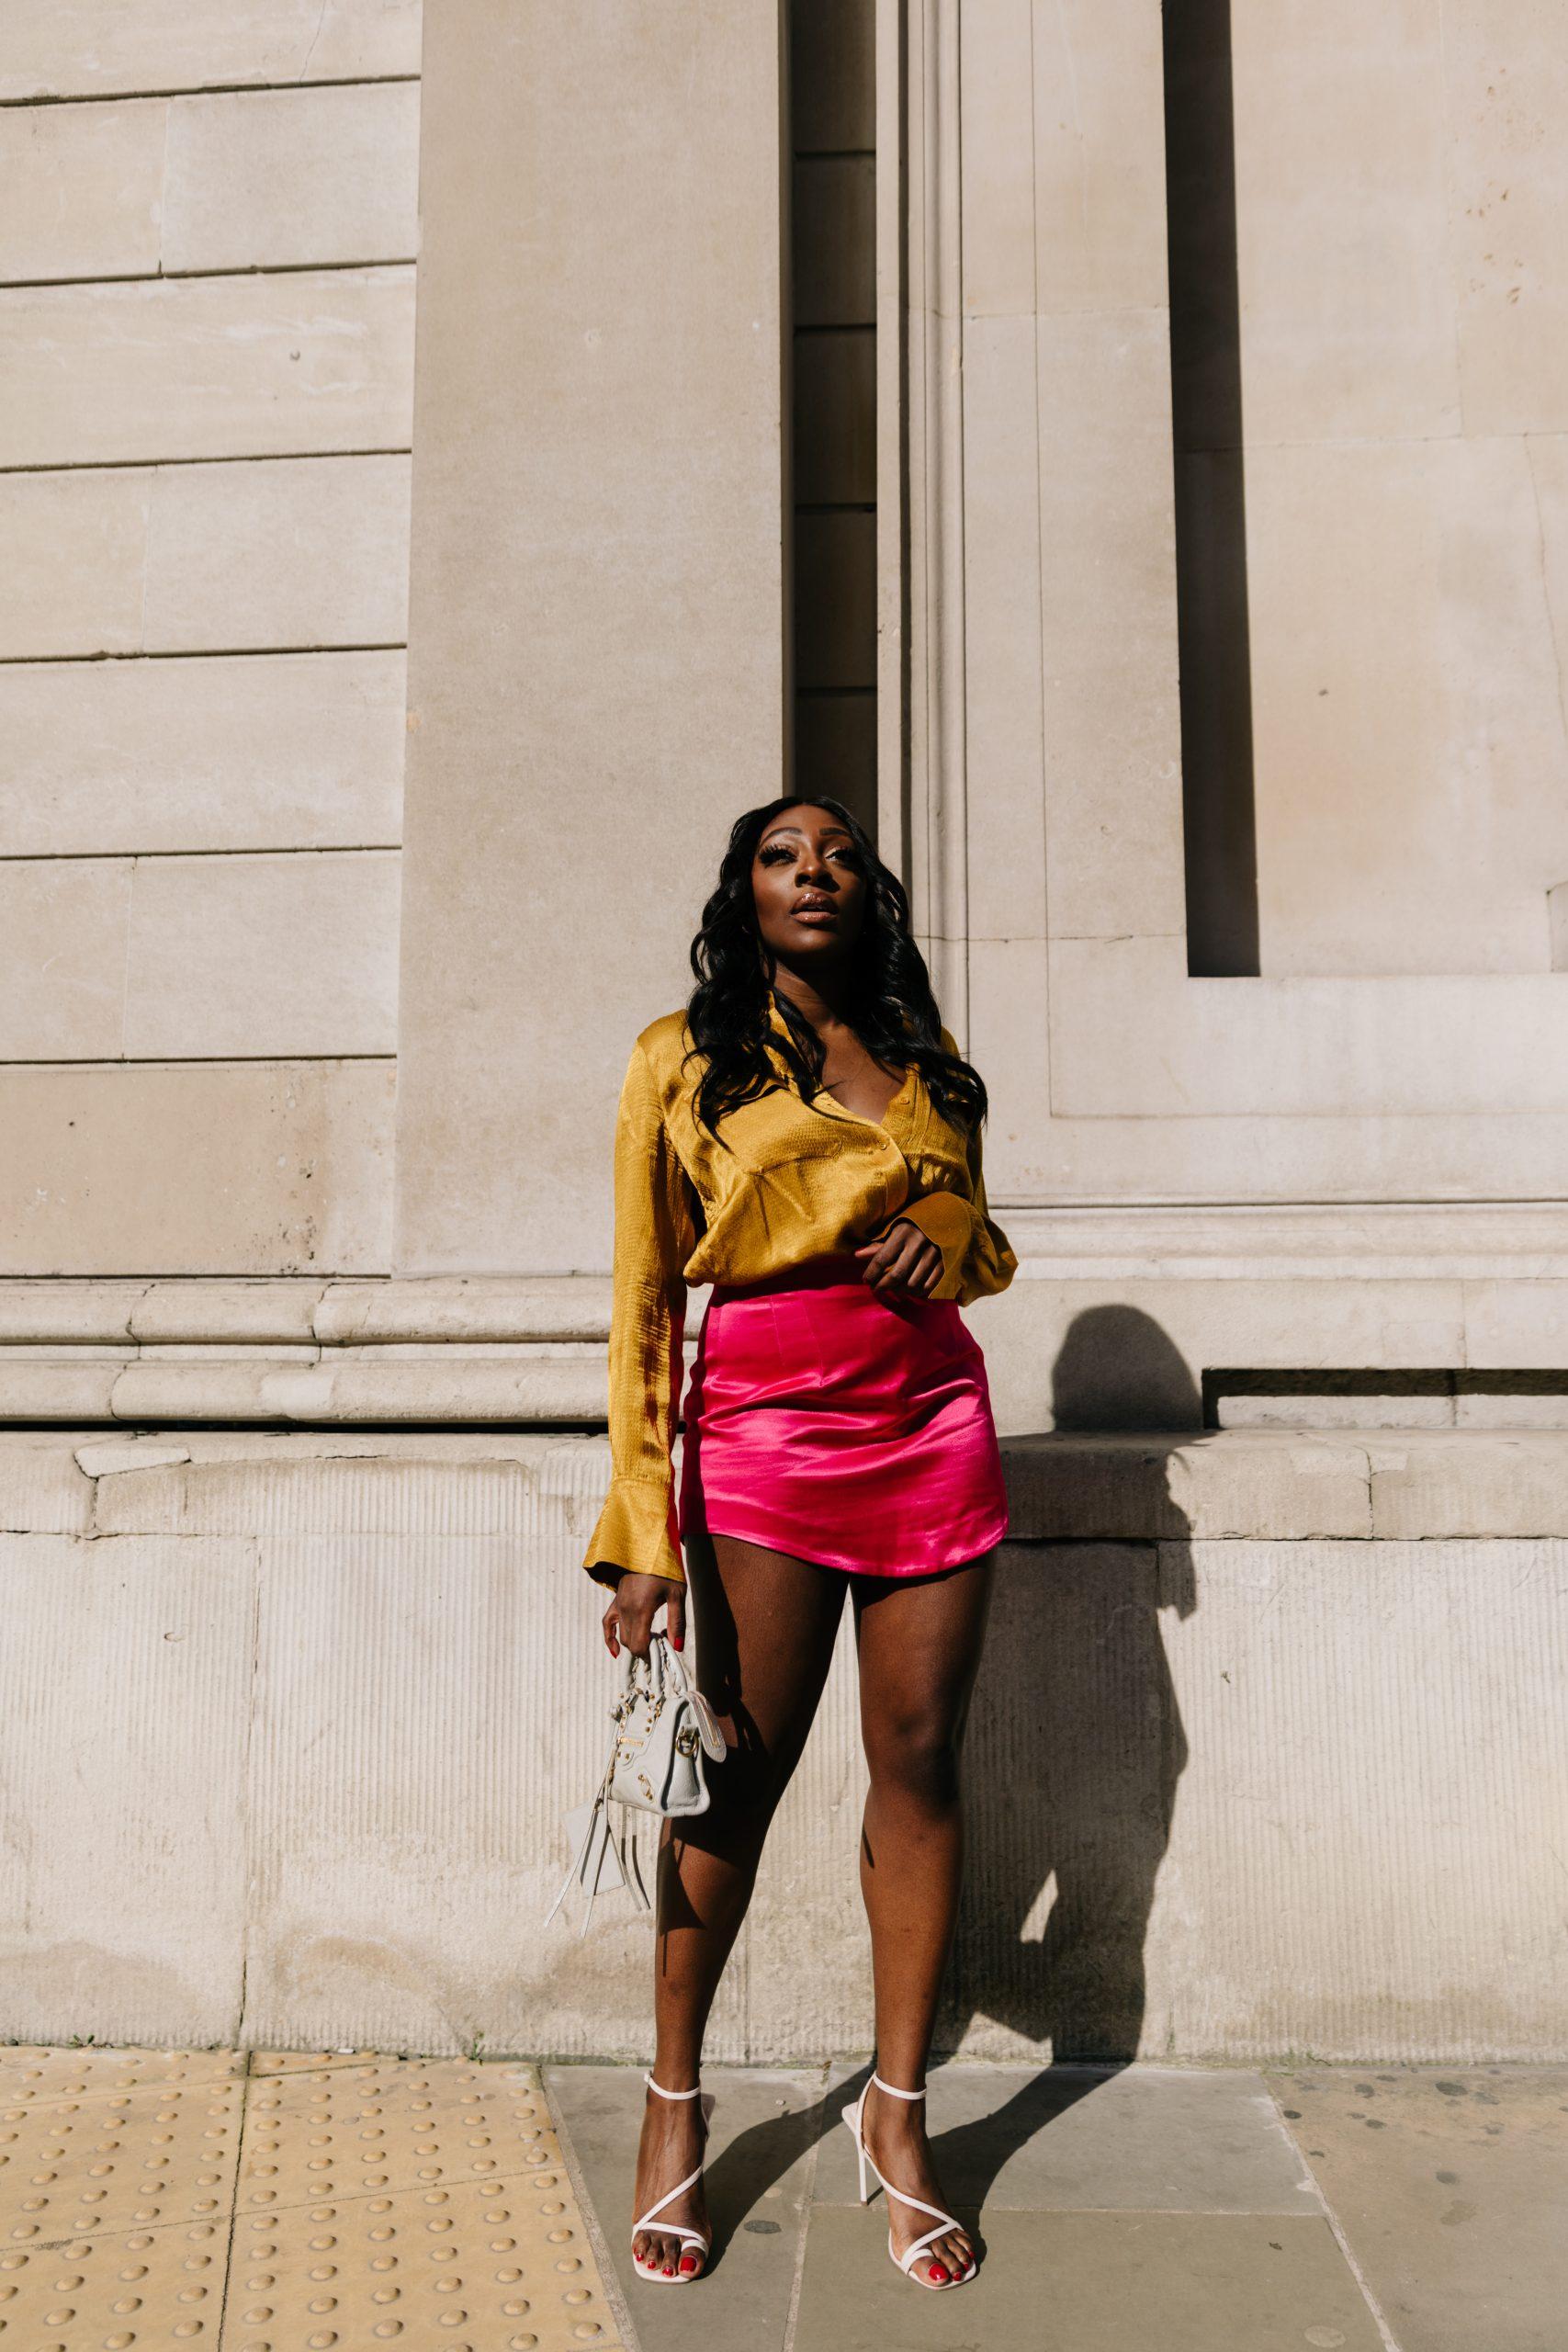 Satin-finish mini skirt Zara - Balenciaga Mini City 1 -Tasha Antwi